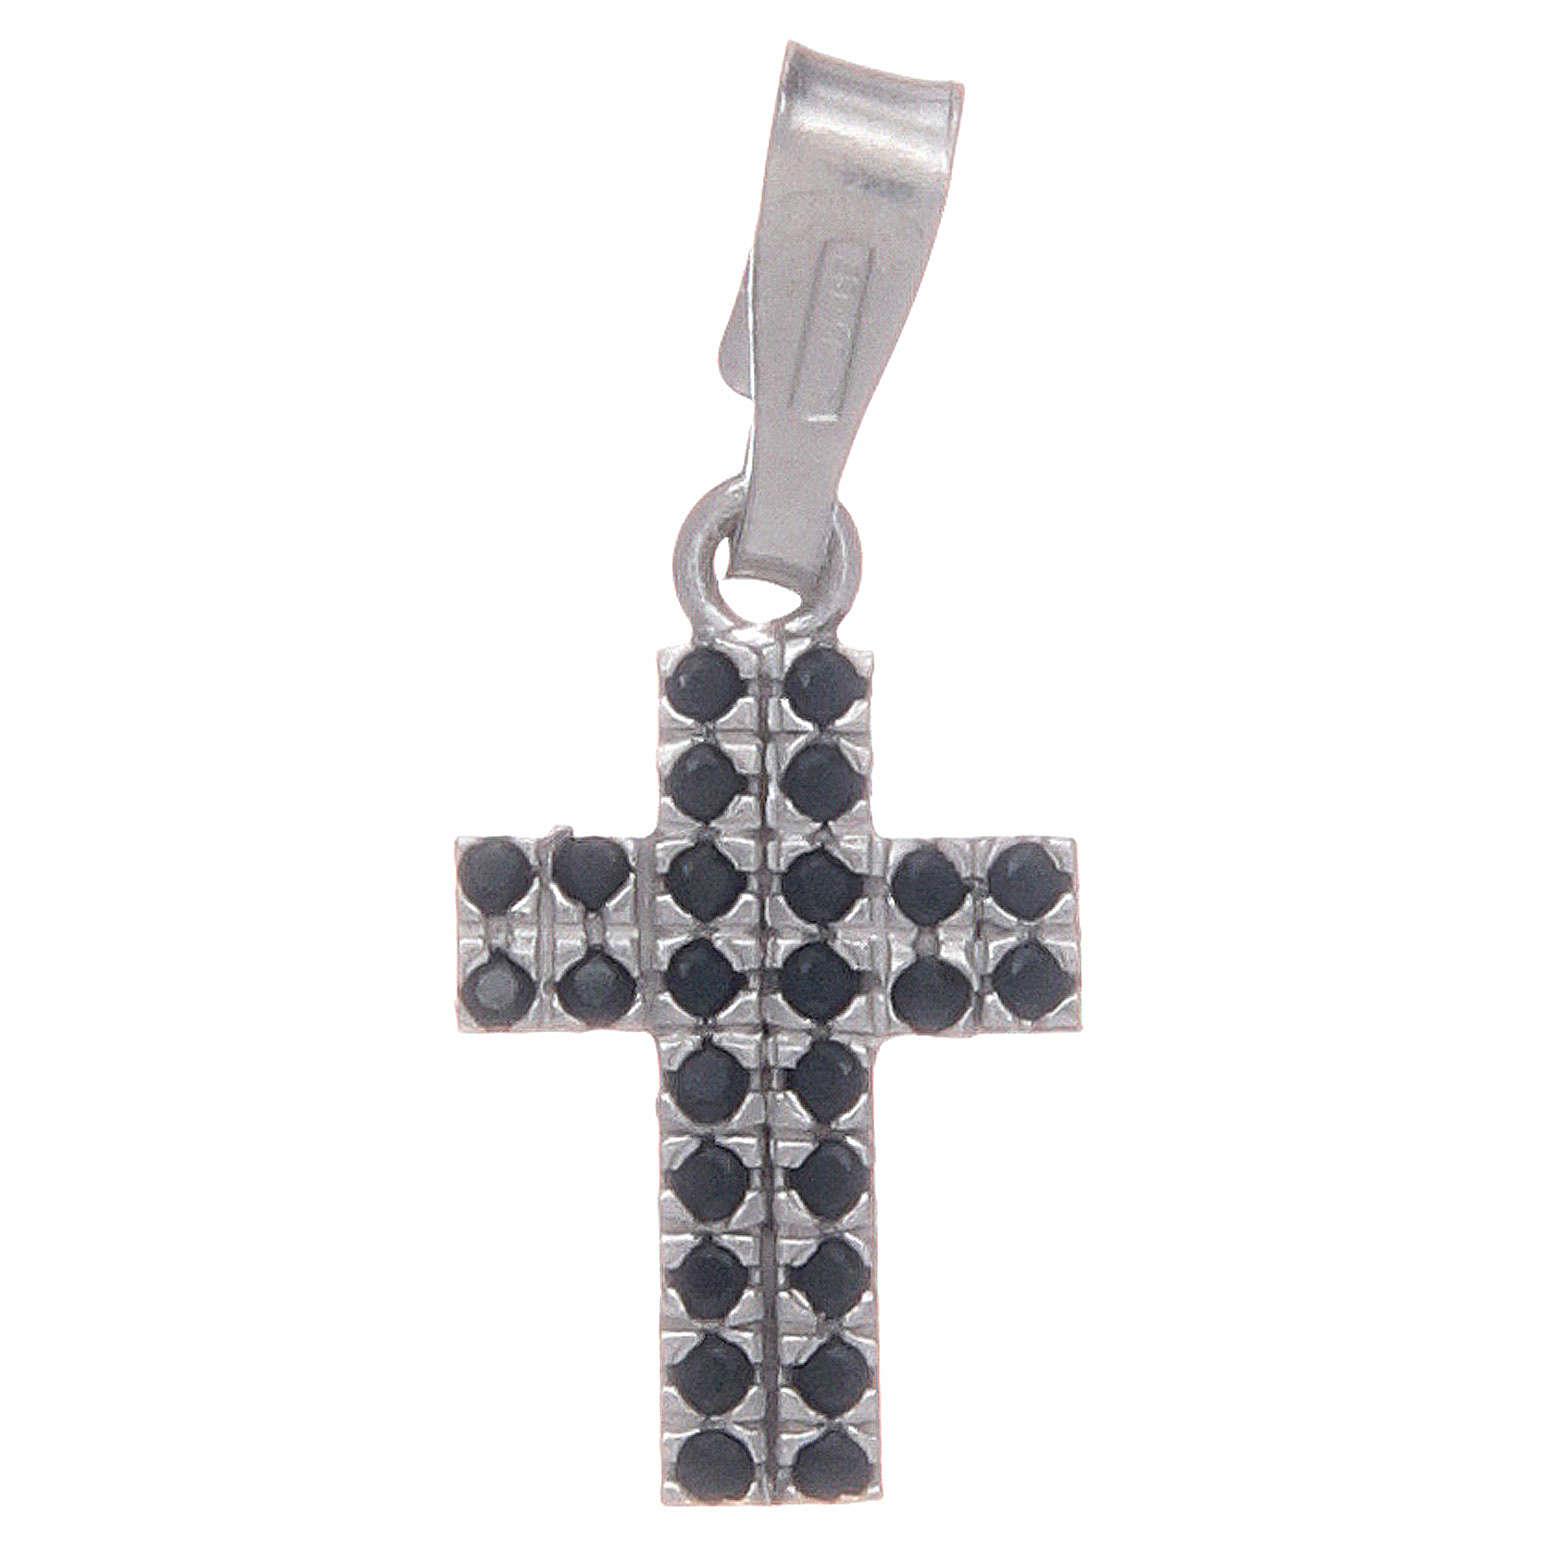 Croce con zirconi neri in Argento 925 4